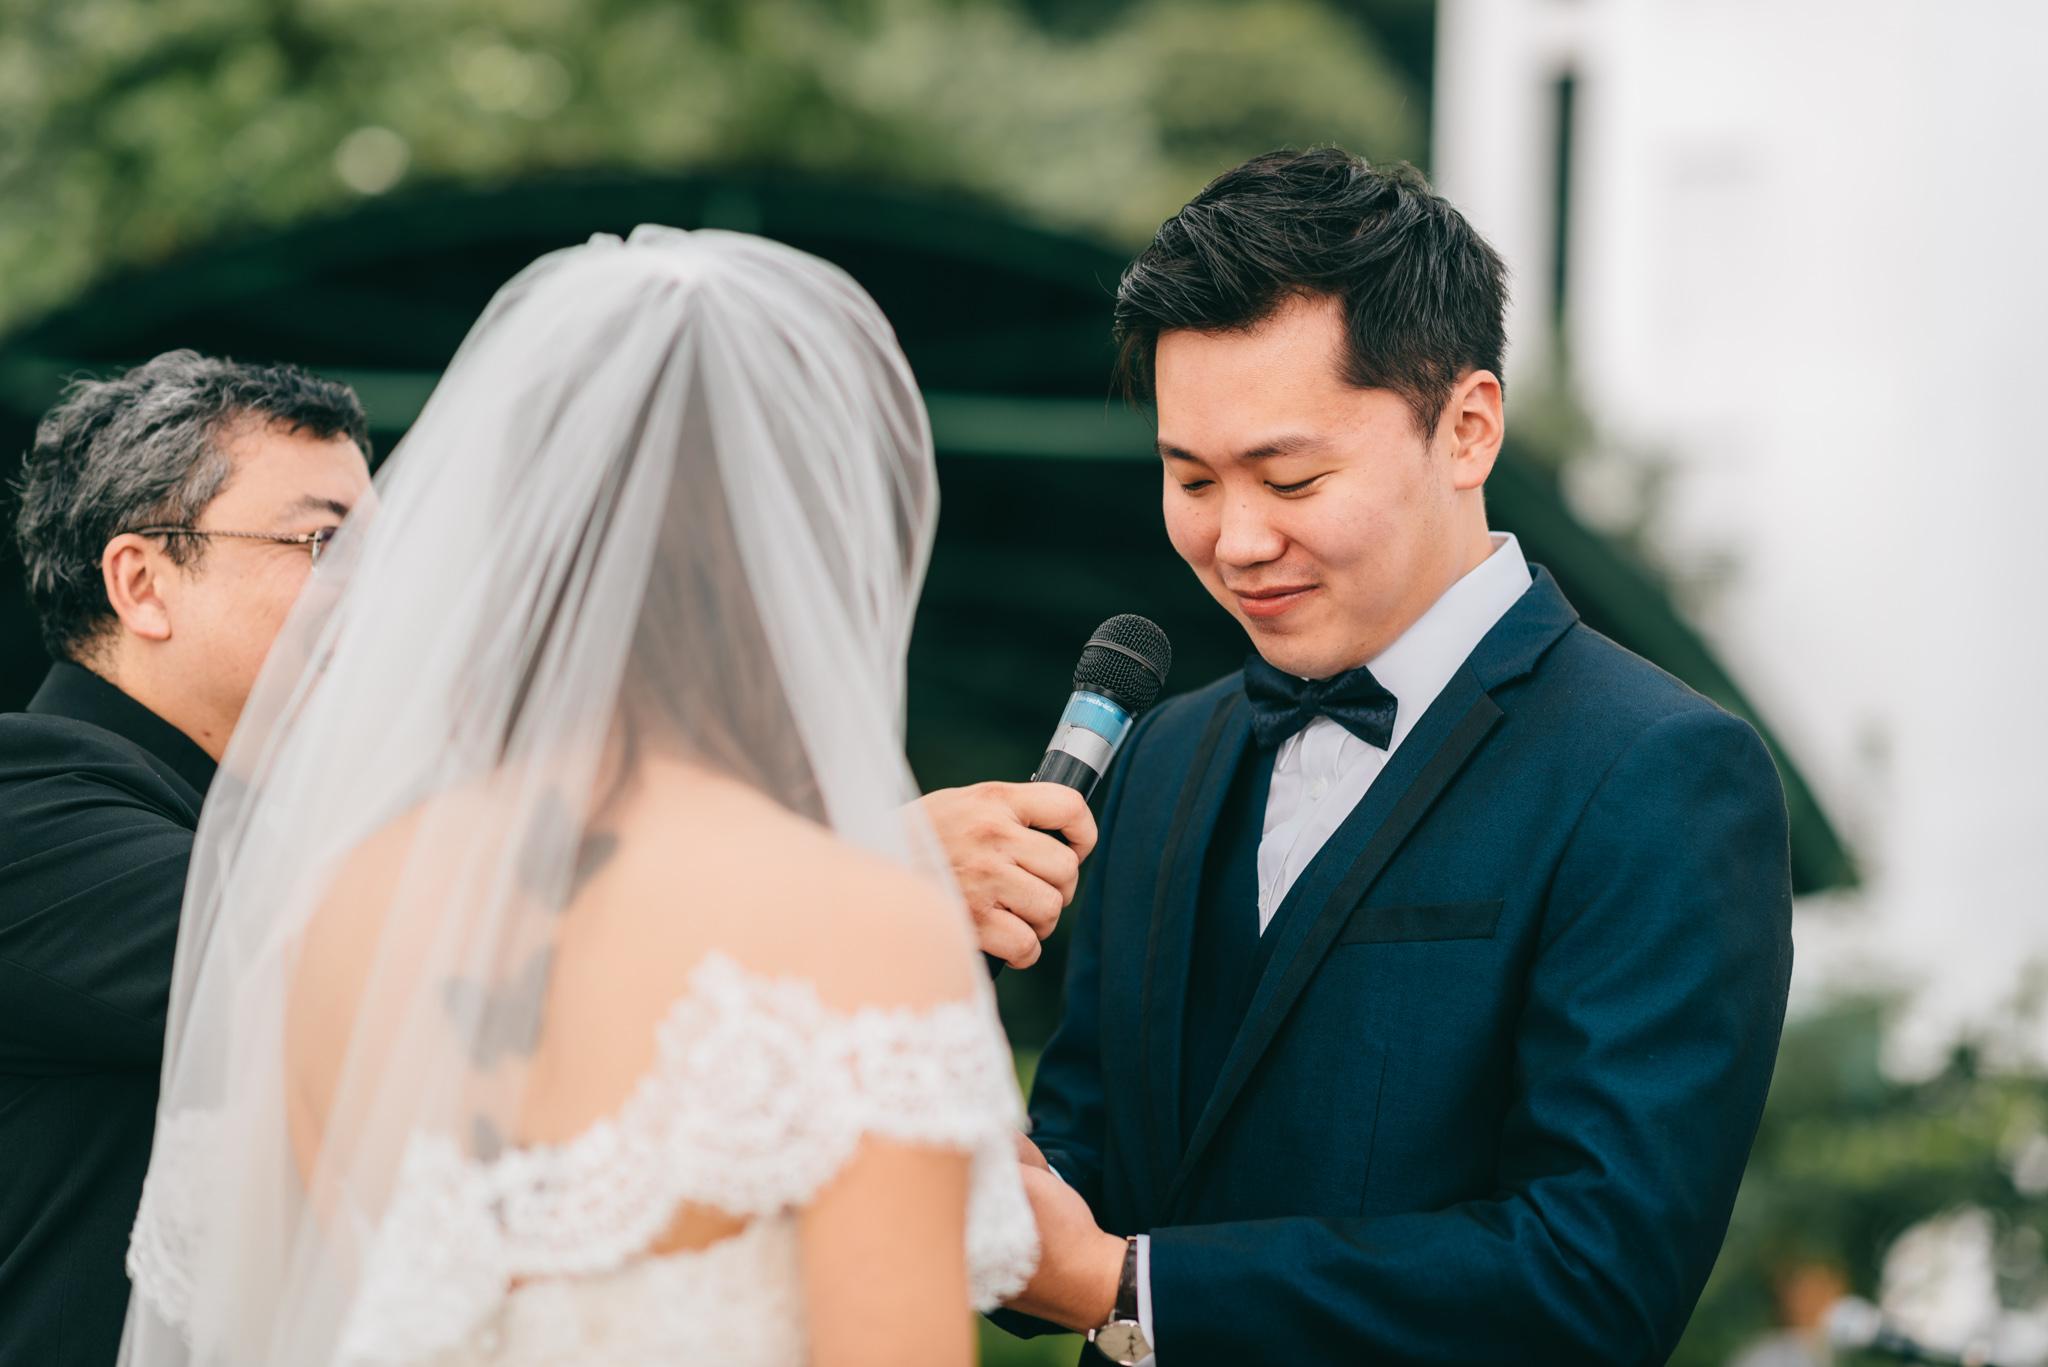 Basil & Vani Wedding Day Highlights (resized for sharing) - 113.jpg